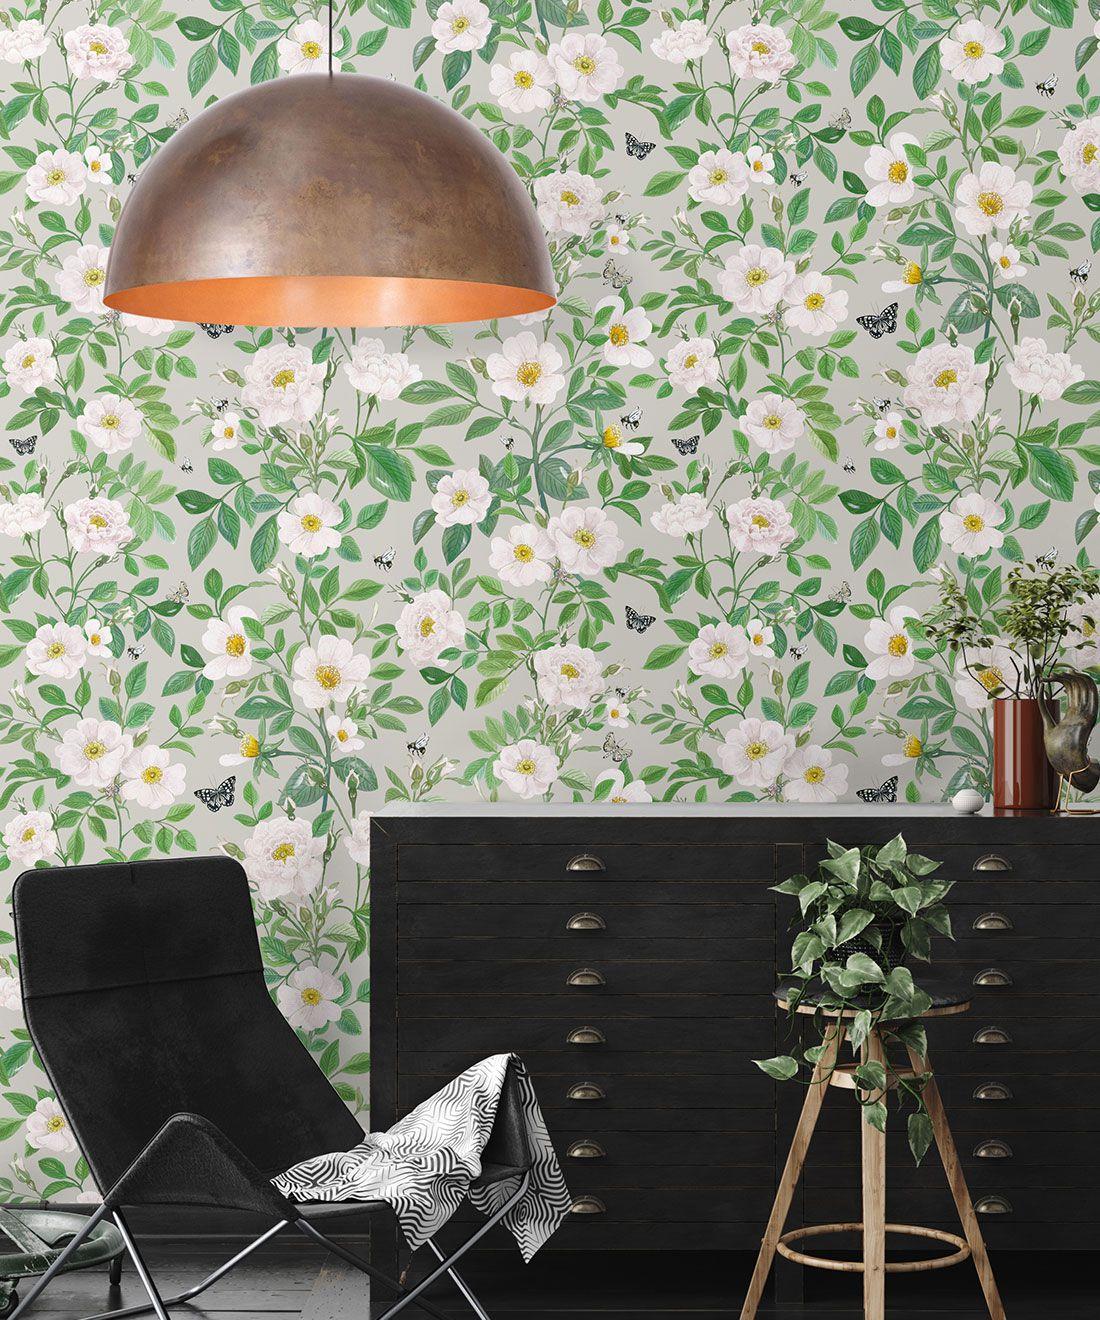 Rosa Wallpaper • Floral Wallpaper • Beige • Insitu